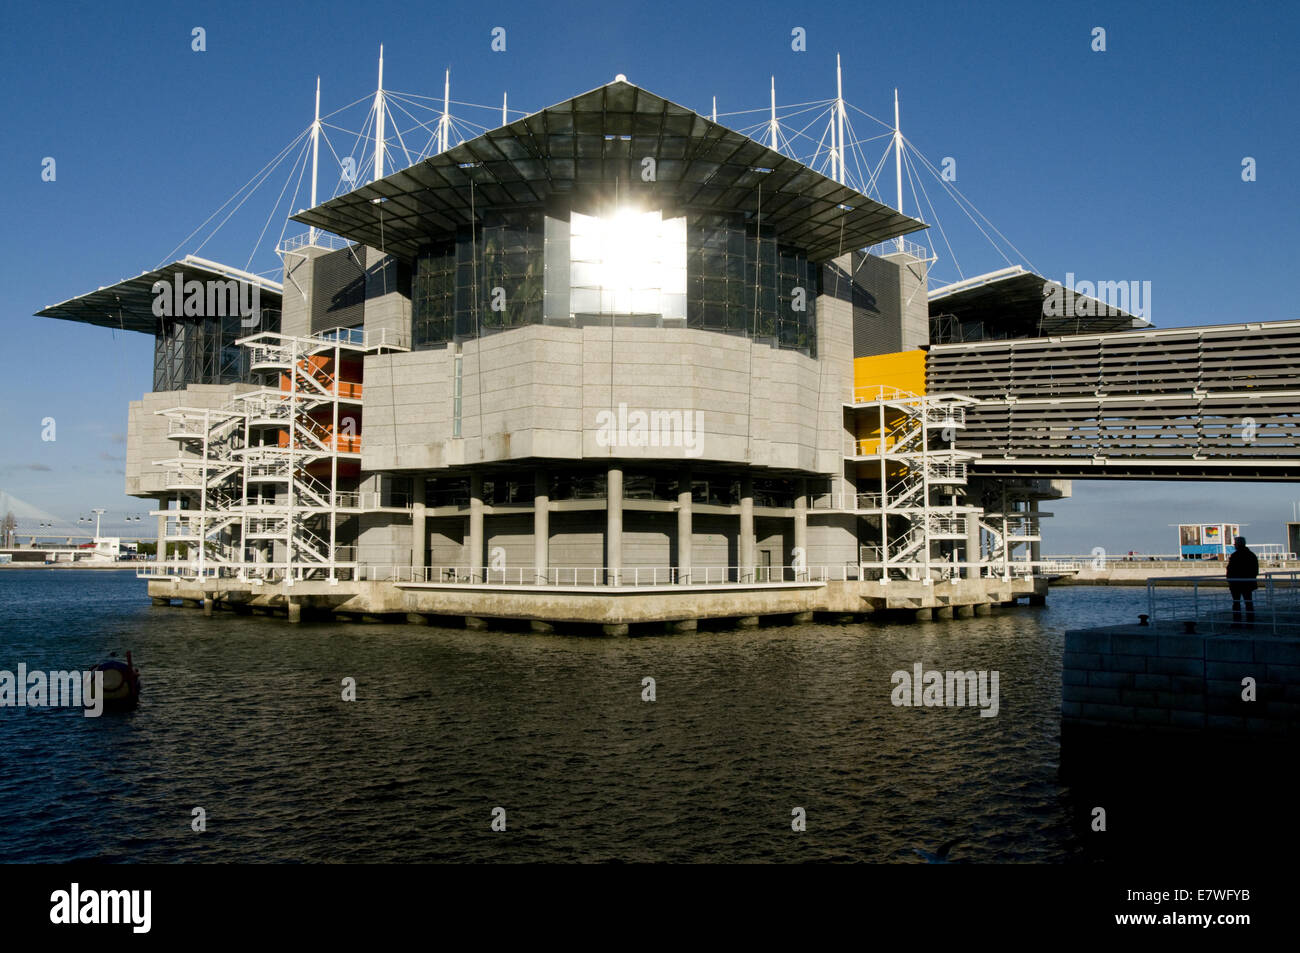 Oceanario (Acquarium), Lisbon, Portugal designed by Peter Chermayeff - Stock Image